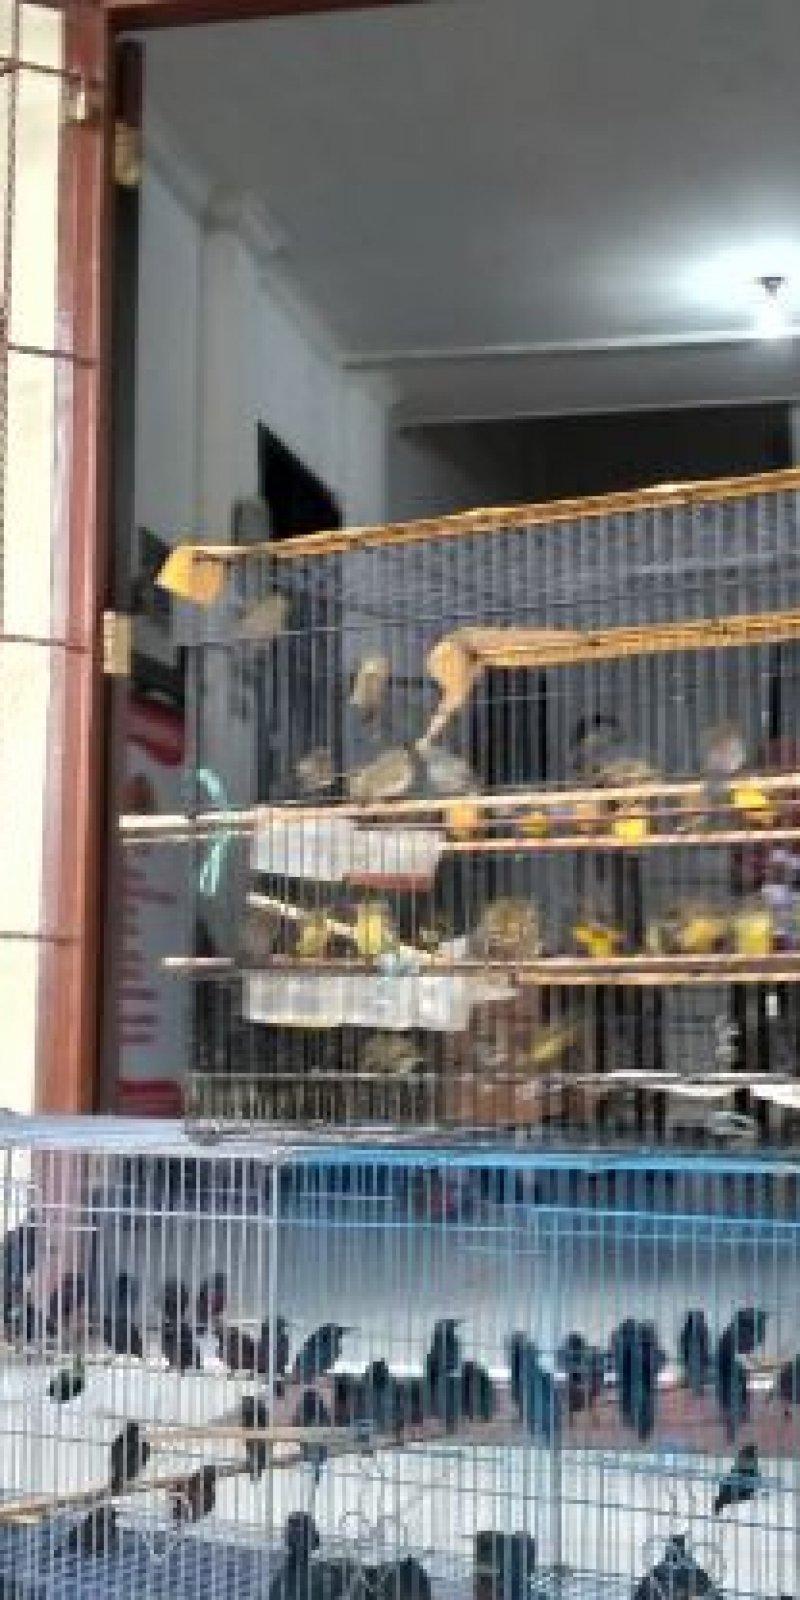 Bksda Jambi Selamatkan 340 Ekor Burung Kolibri Antara News Jambi